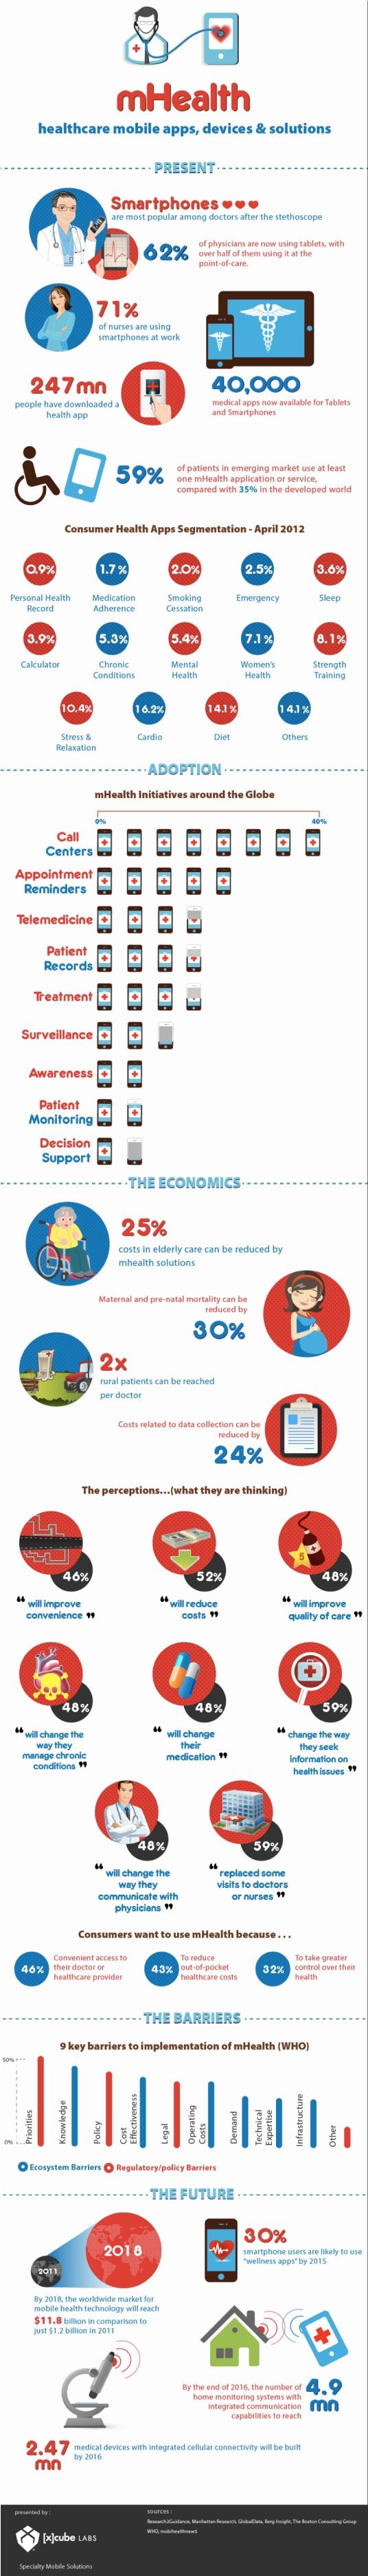 2. Health on Smartphone